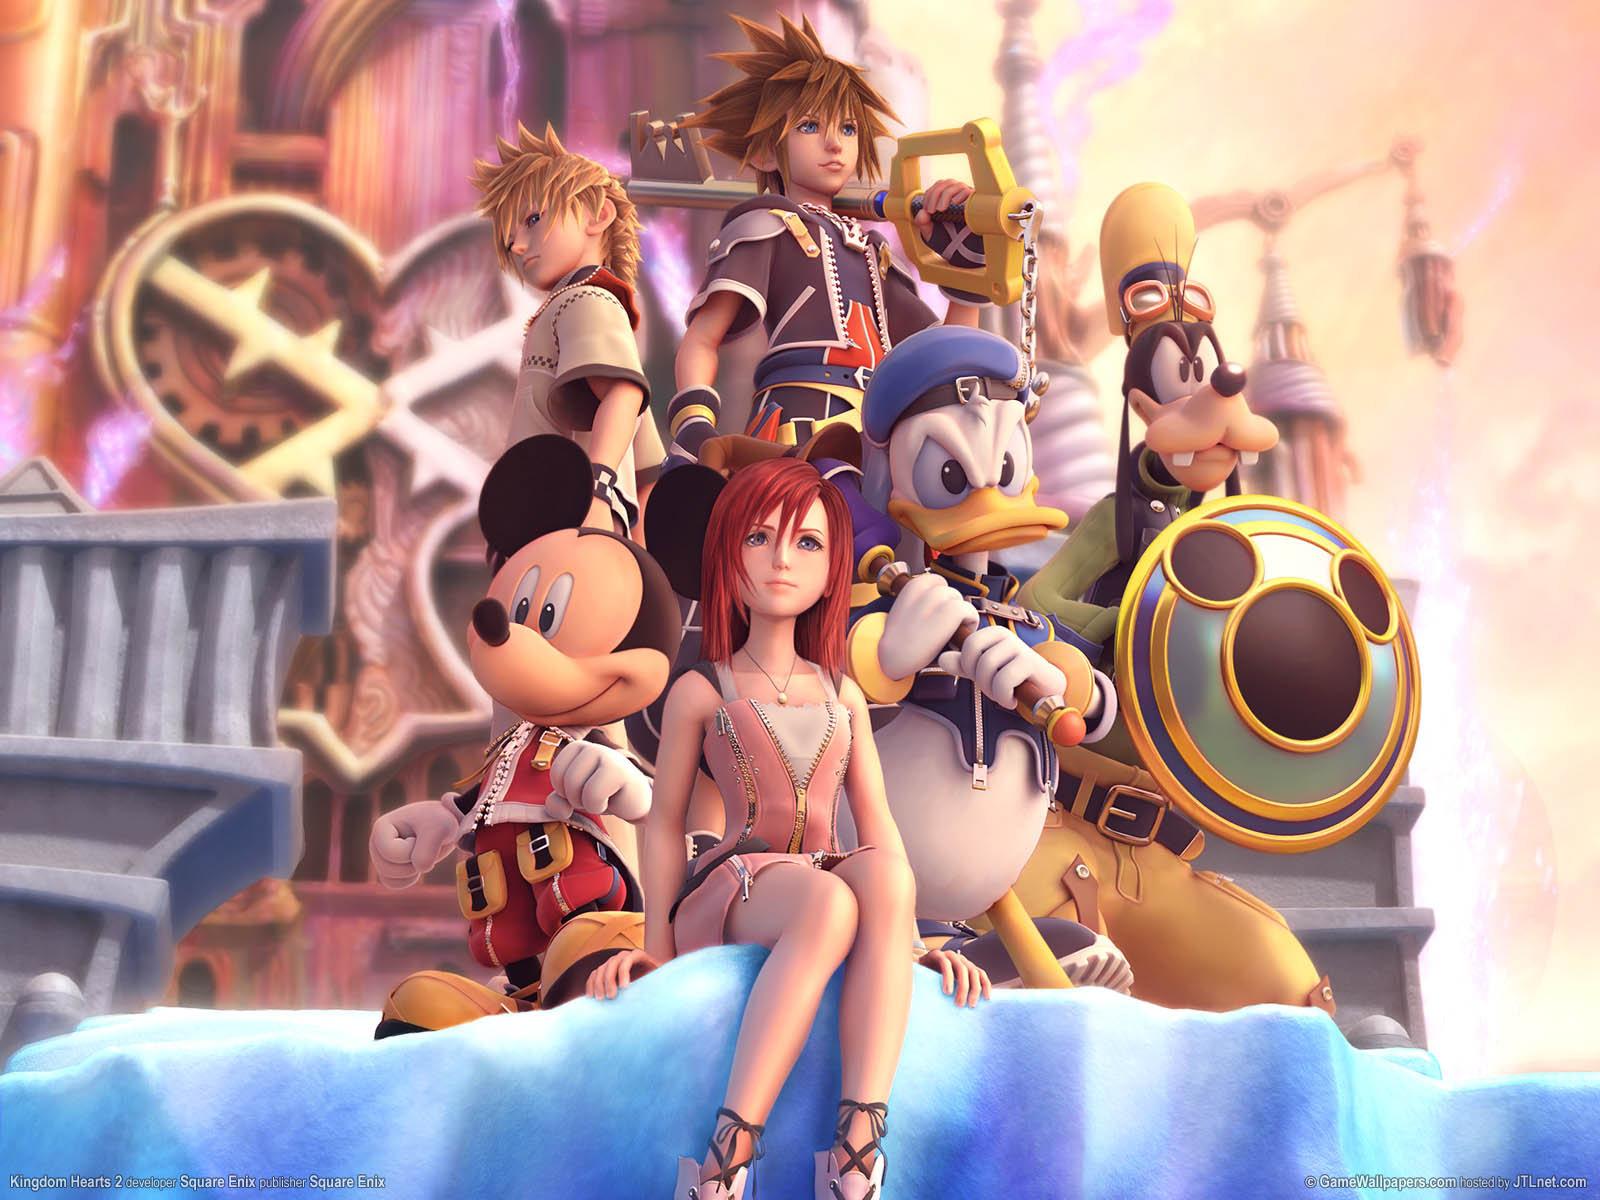 Kingdom Hearts wallpaper by TheKingdomHearts FC 1600x1200